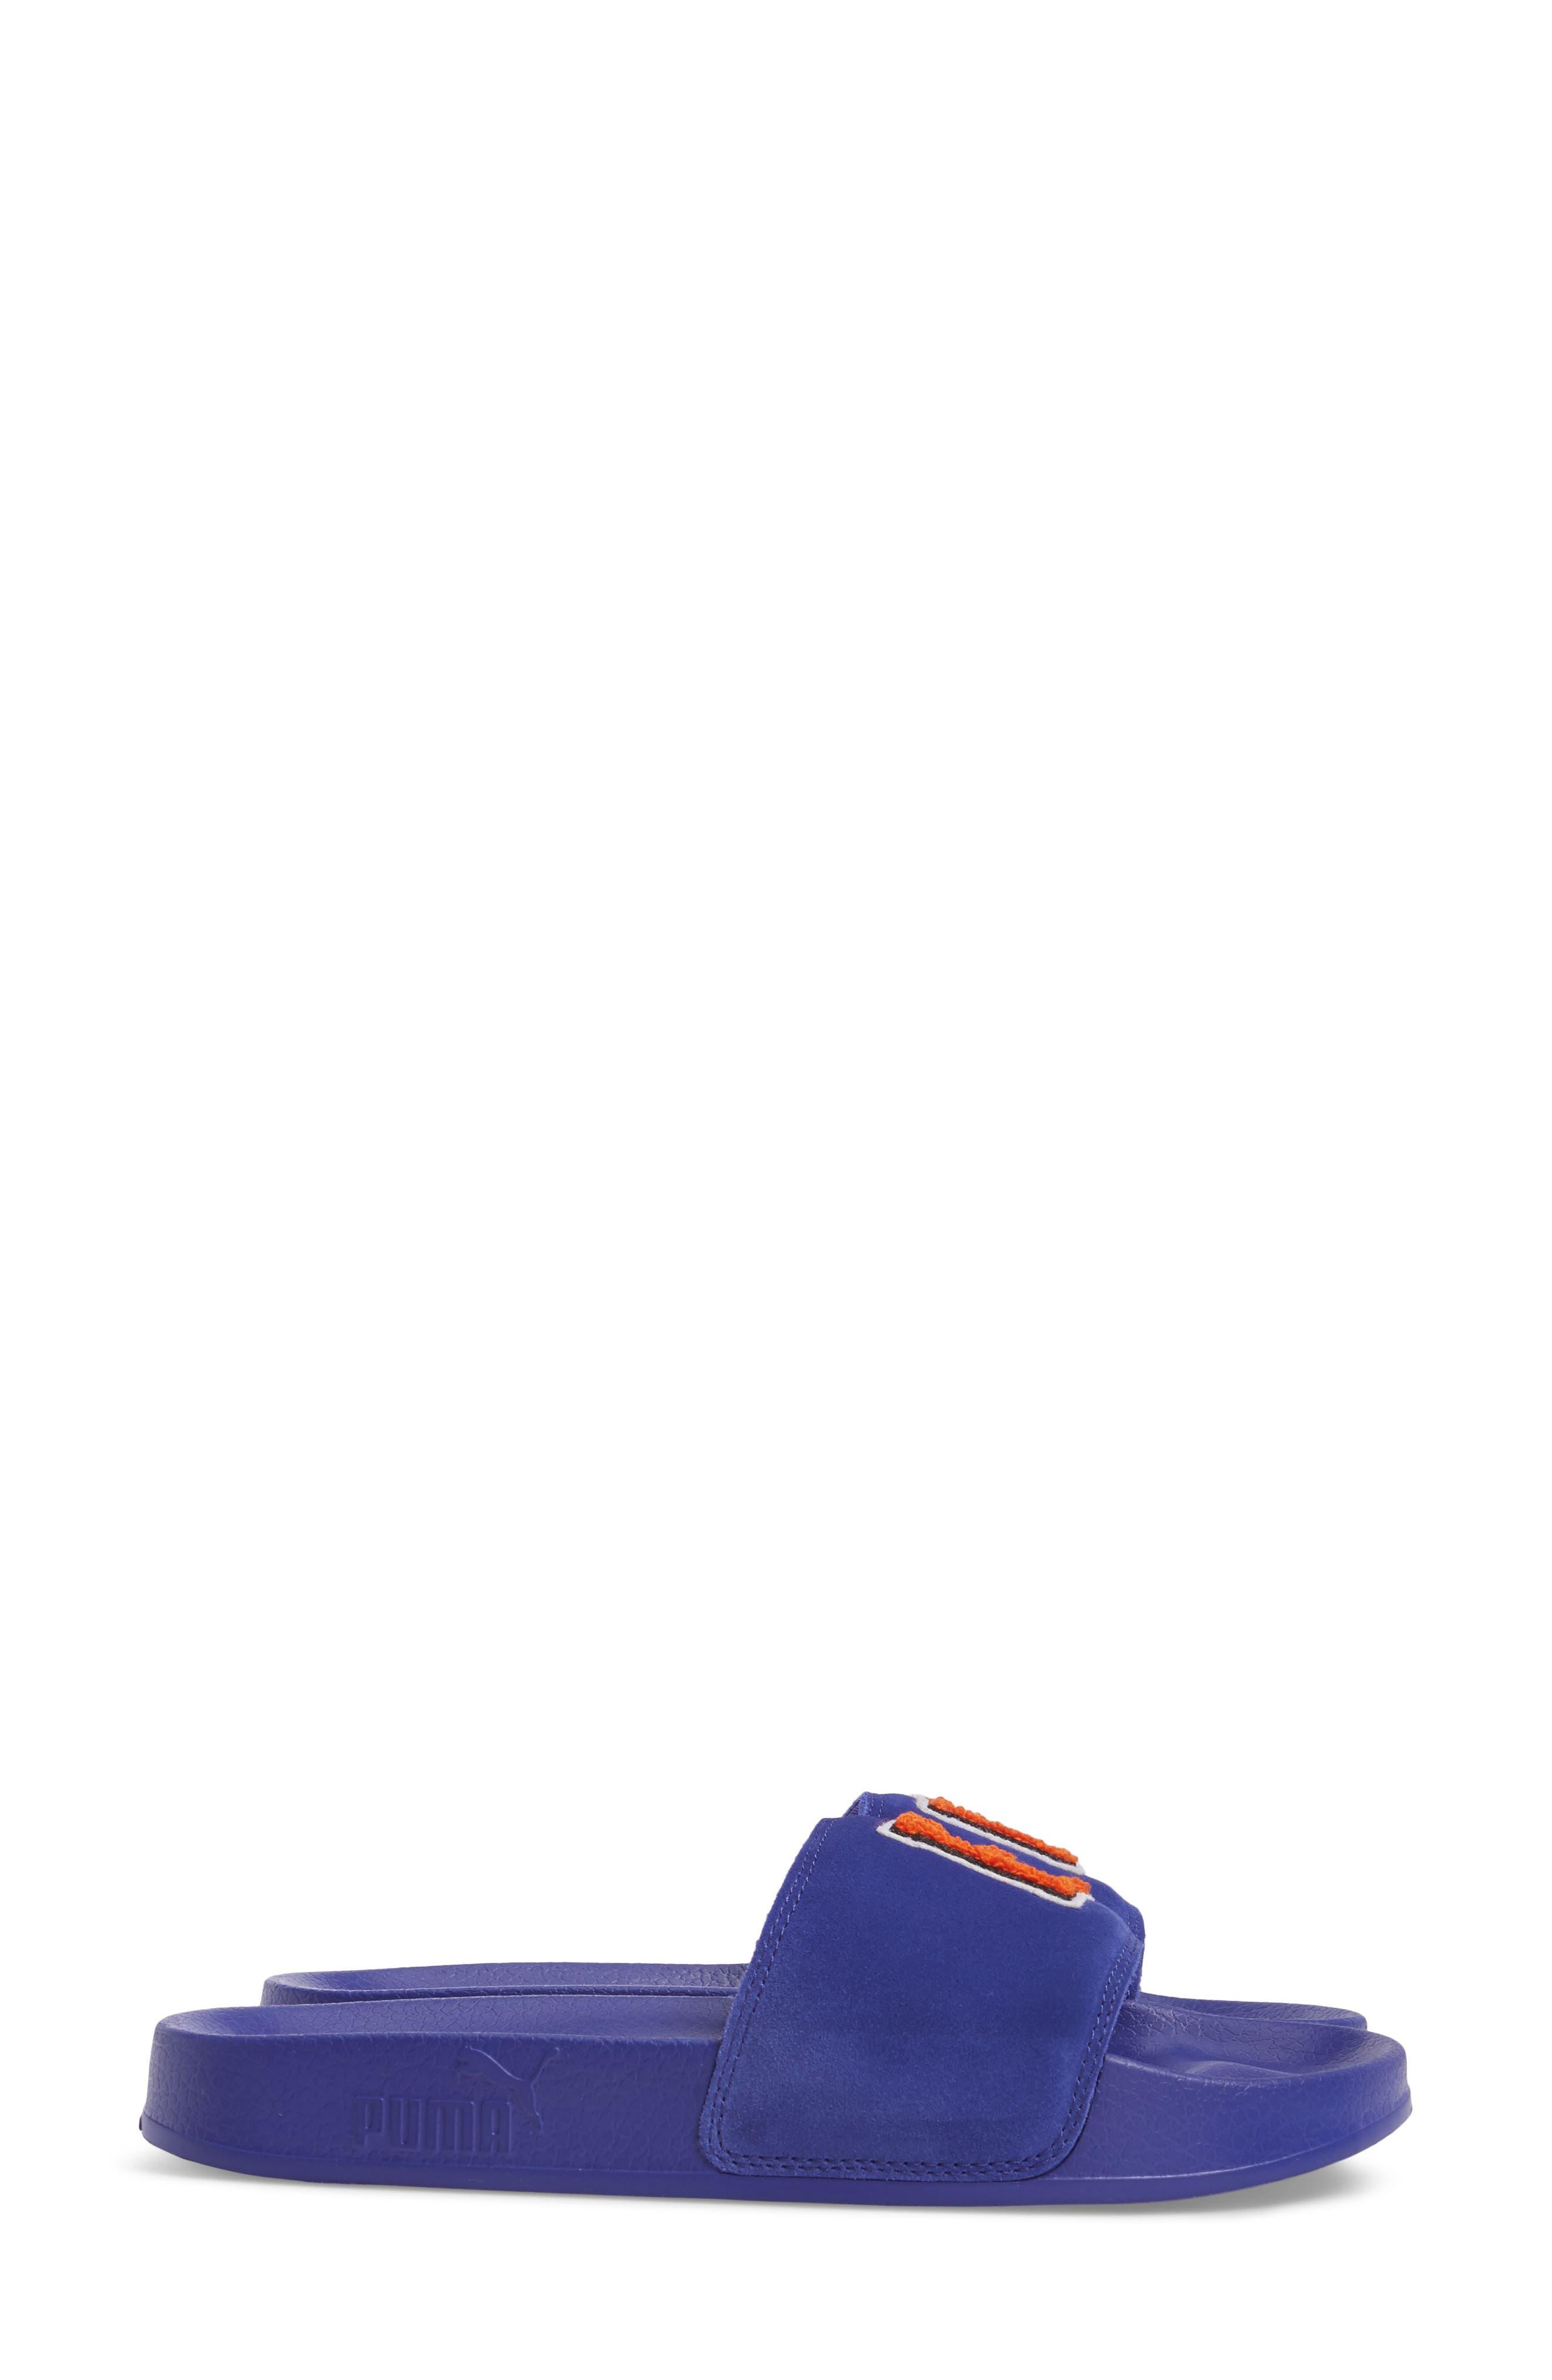 FENTY PUMA by Rihanna Lead Cat Slide Sandals,                             Alternate thumbnail 10, color,